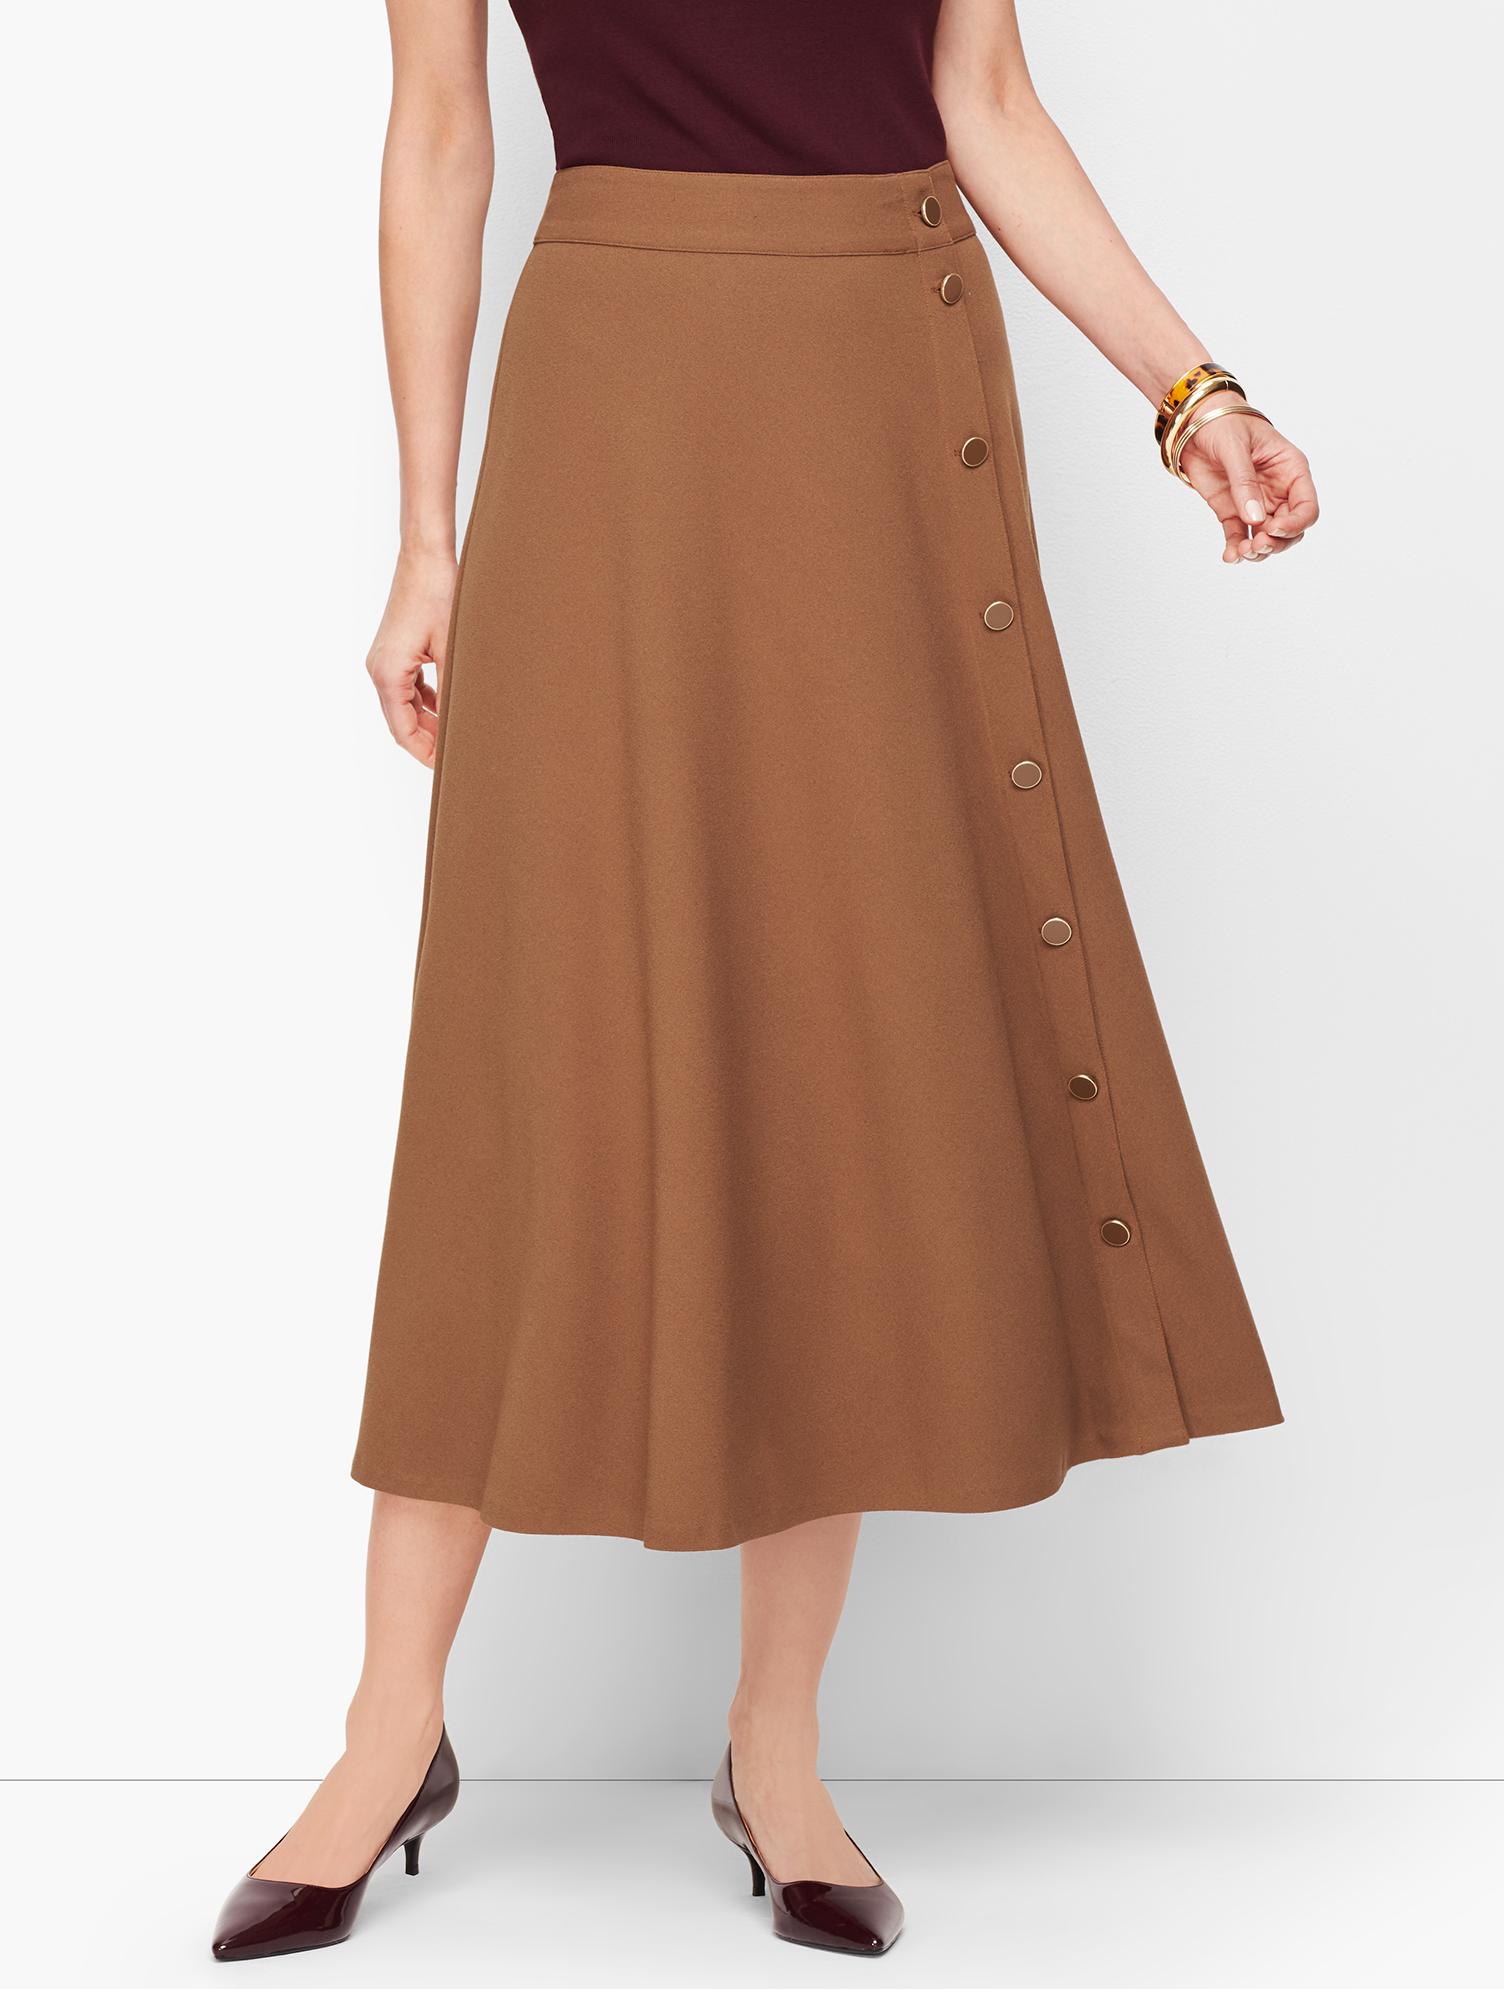 60s Skirts | 70s Hippie Skirts, Jumper Dresses Stretch Crepe Midi Skirt - BROWN-SUGAR - 16 - Talbots $119.00 AT vintagedancer.com